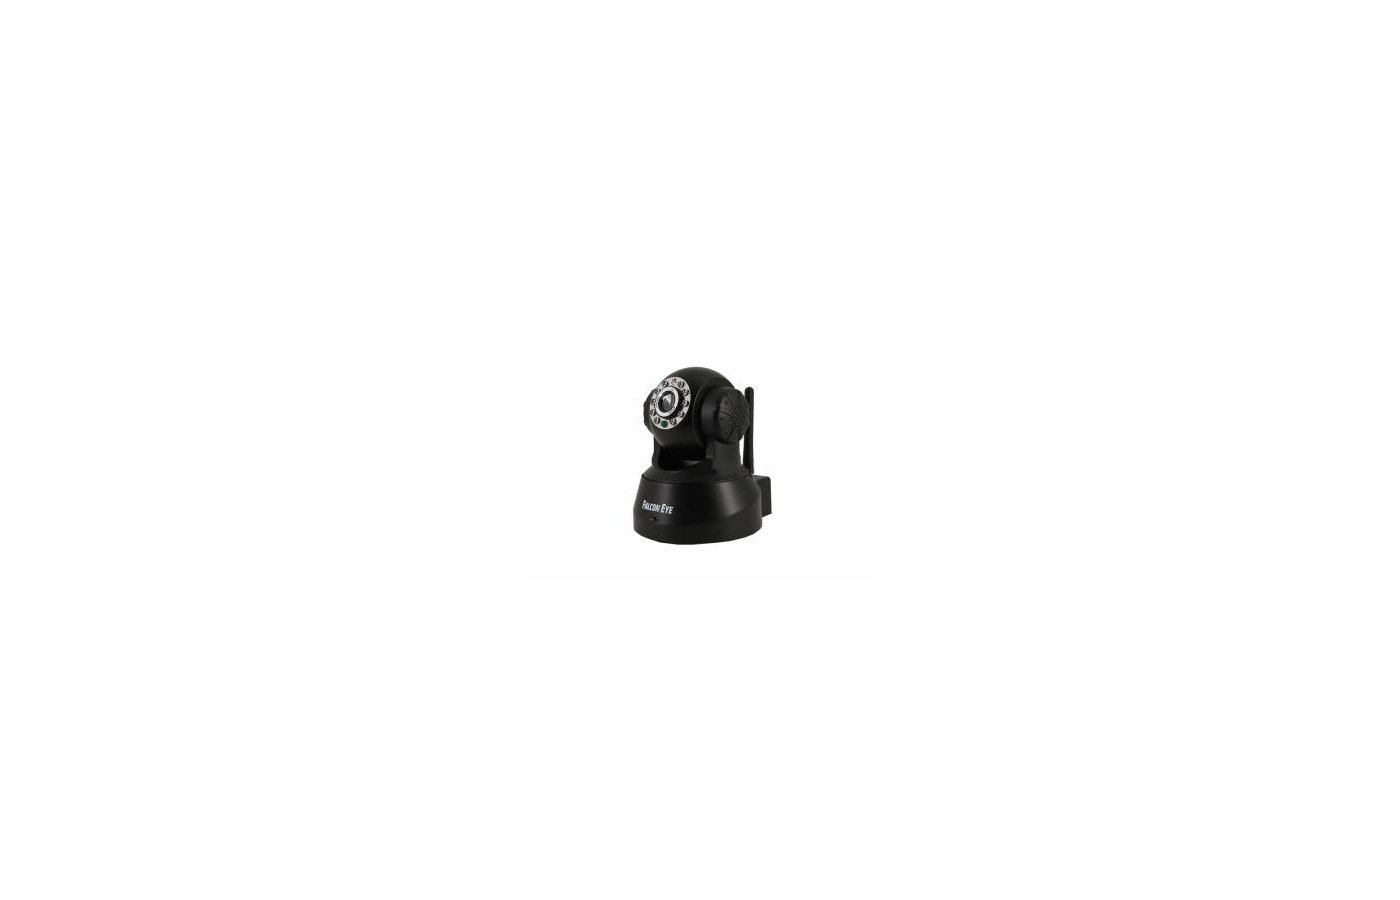 Система видеонаблюдения Falcon Камера видеонаблюдения Eye FE-MTR300Bl-P2P